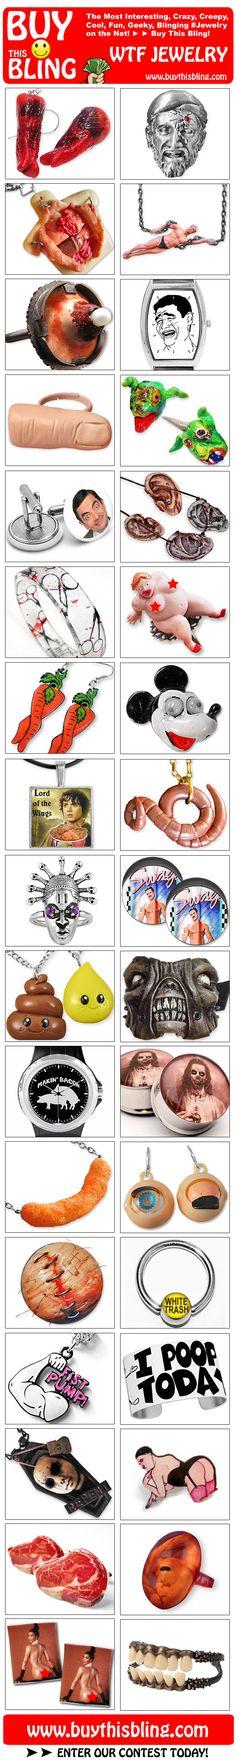 WTF Jewelry on the Web!!! HA!